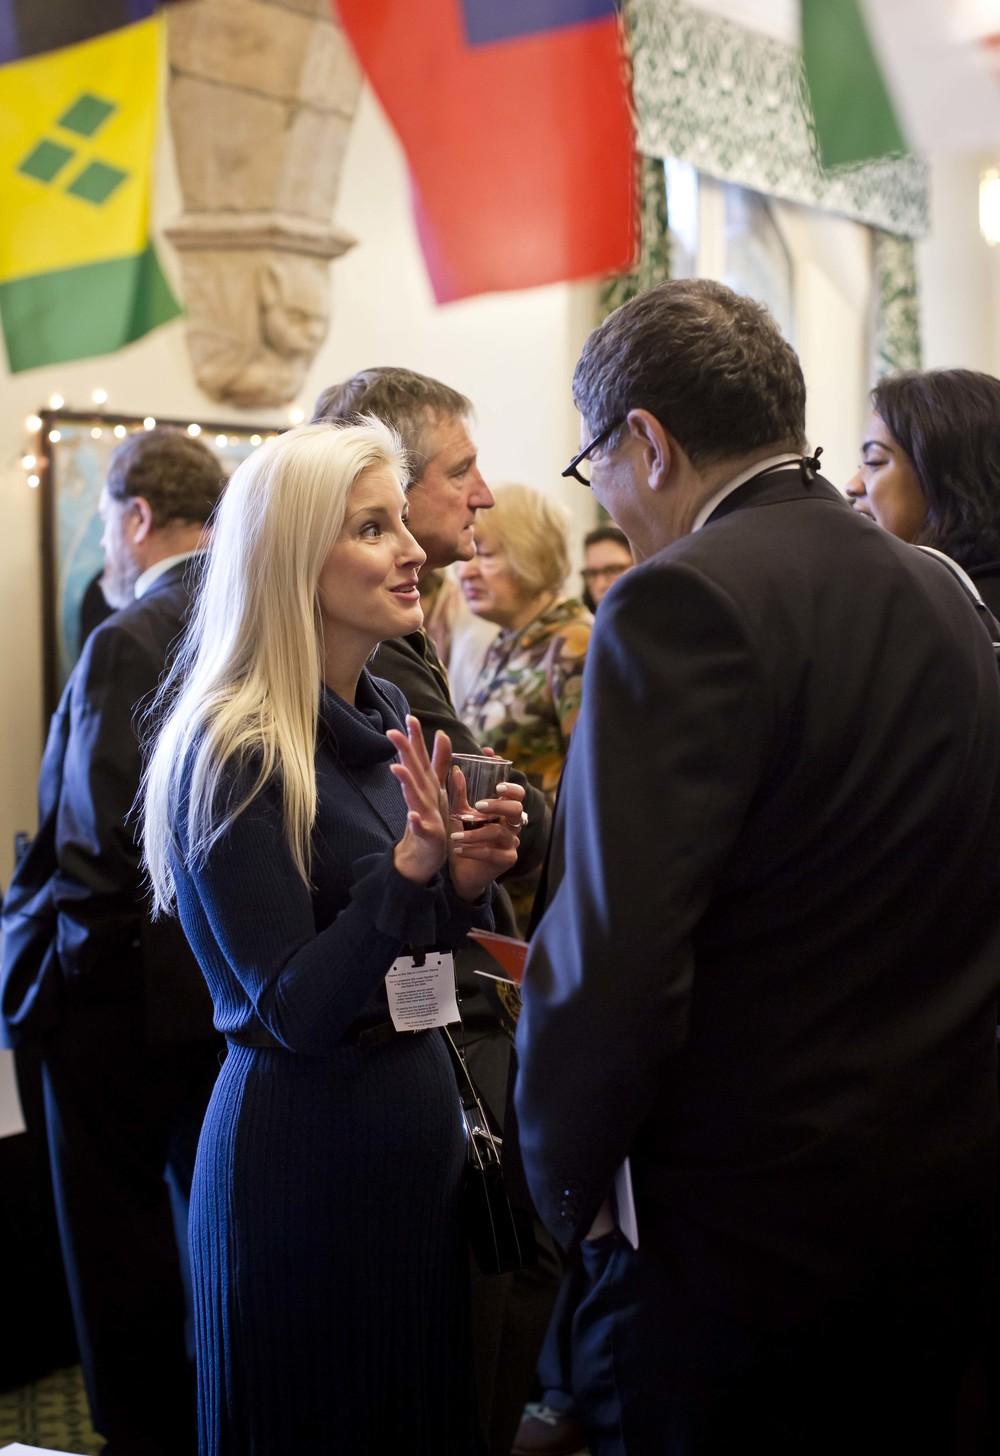 Commonwealth food event 2014-2575.jpg